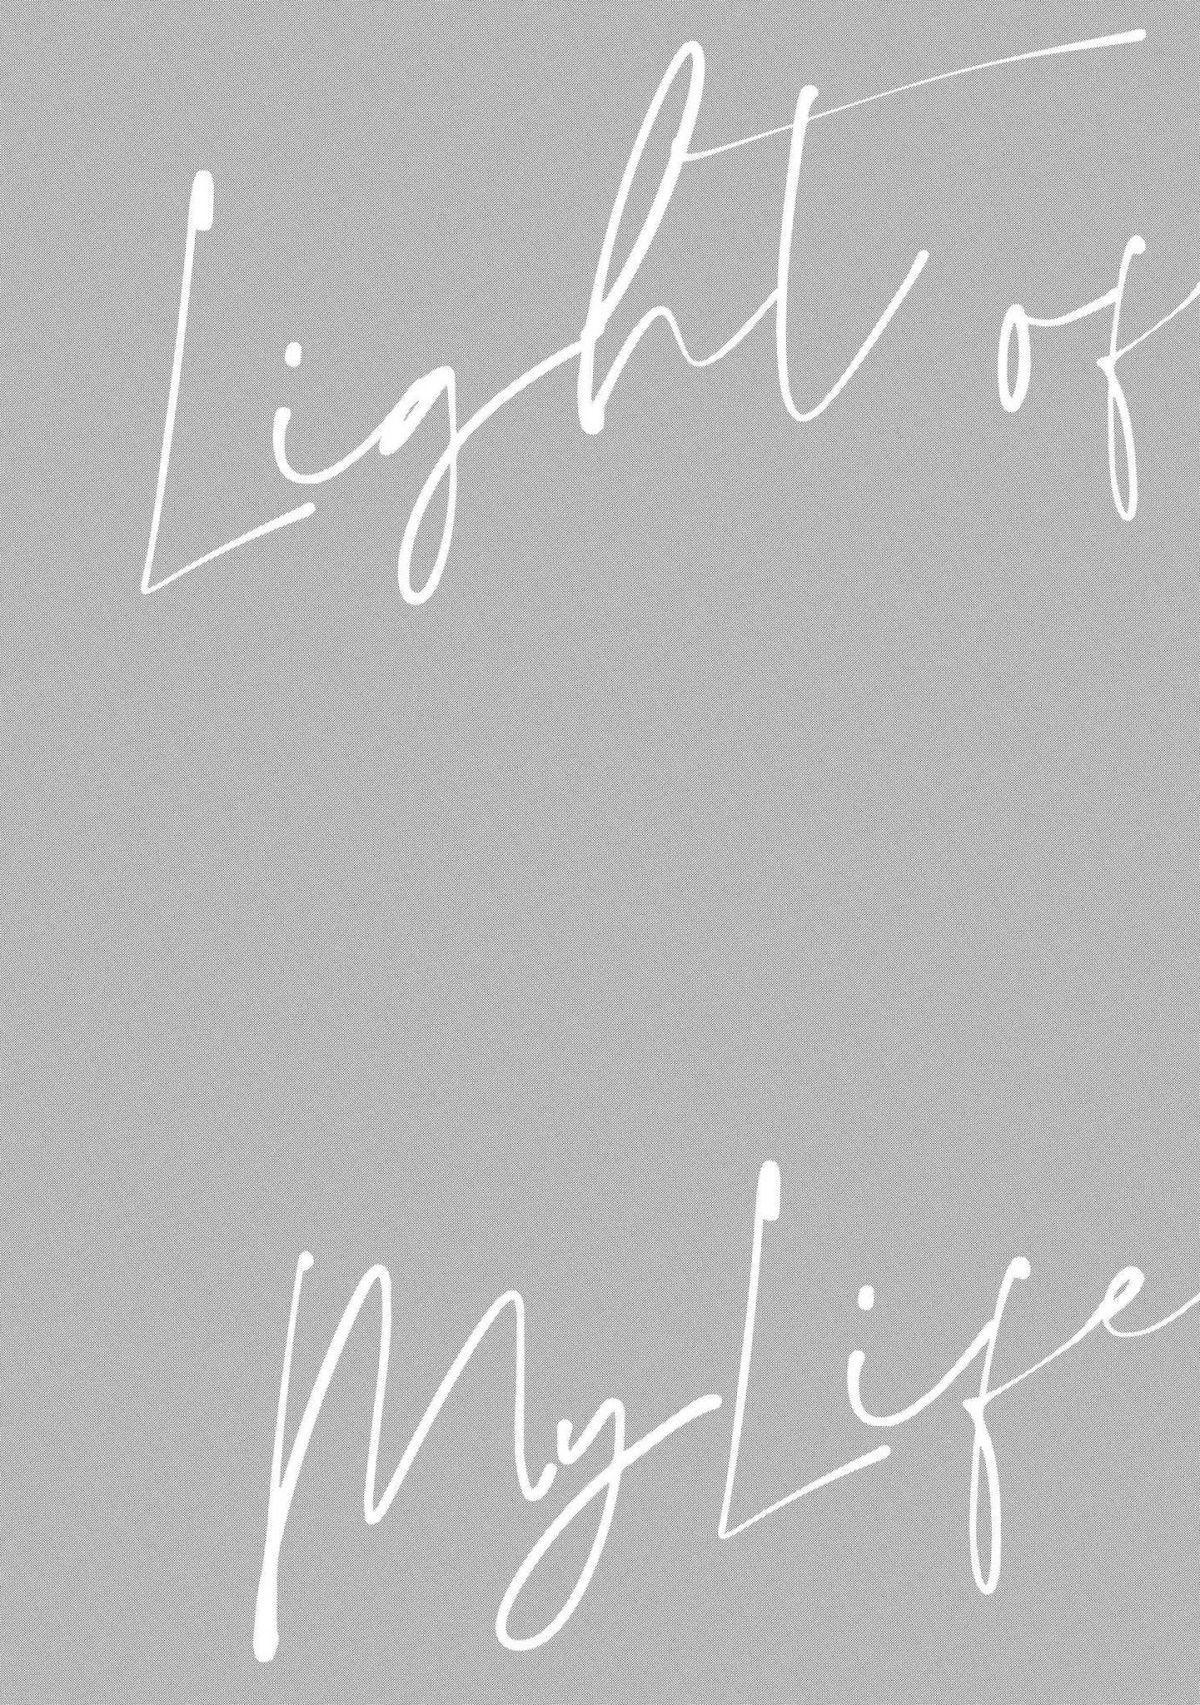 Light of my life | 生命之光 02-05 89